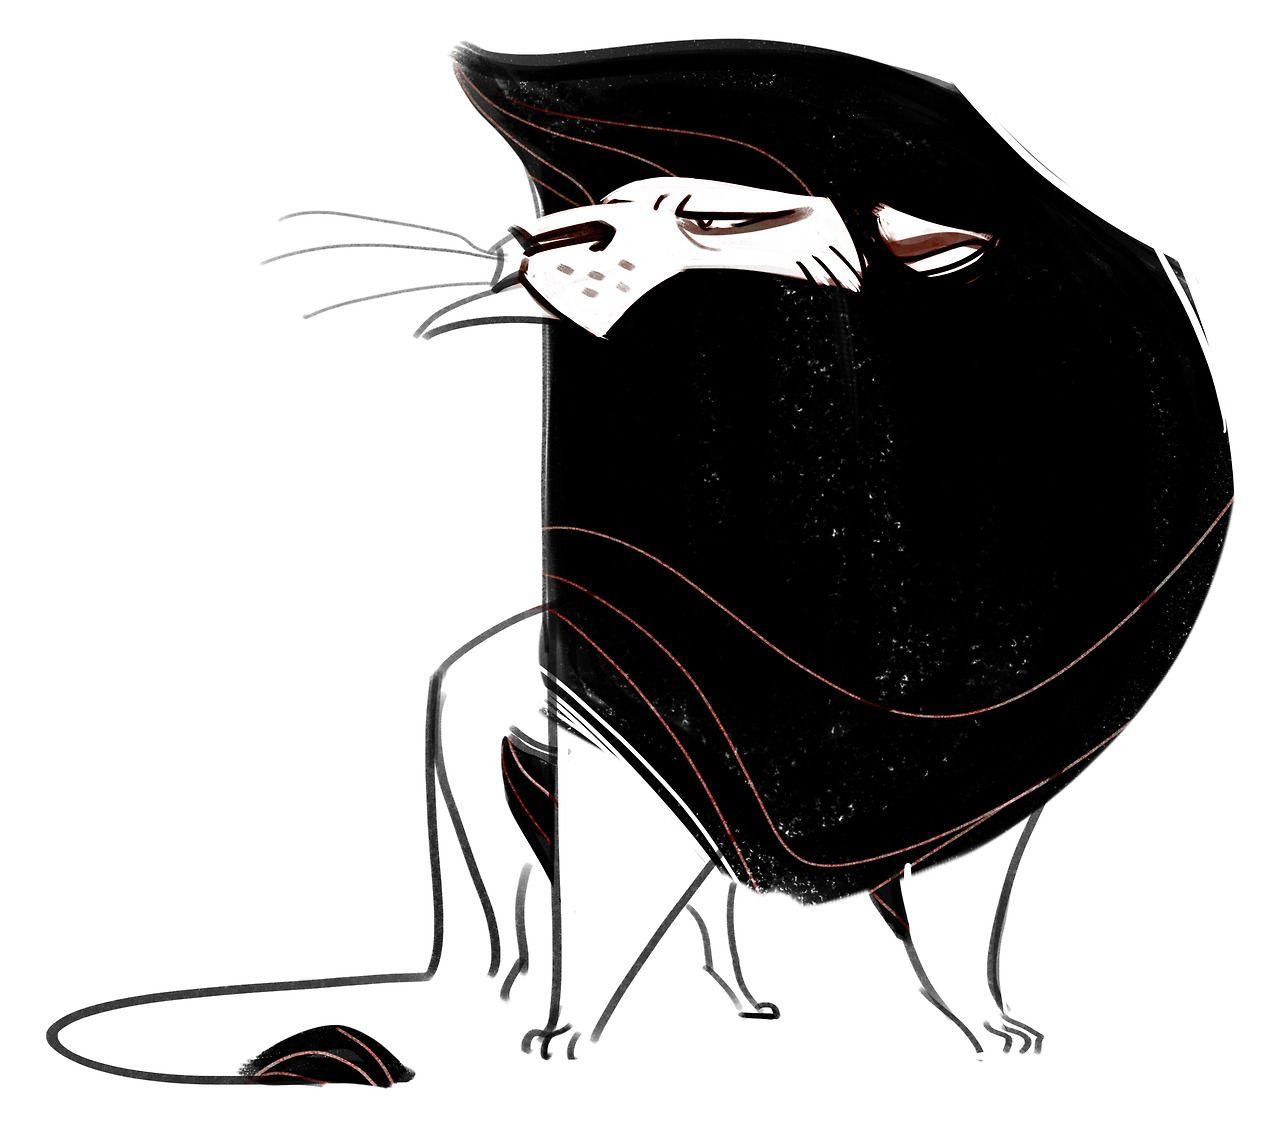 lion sketch character design references